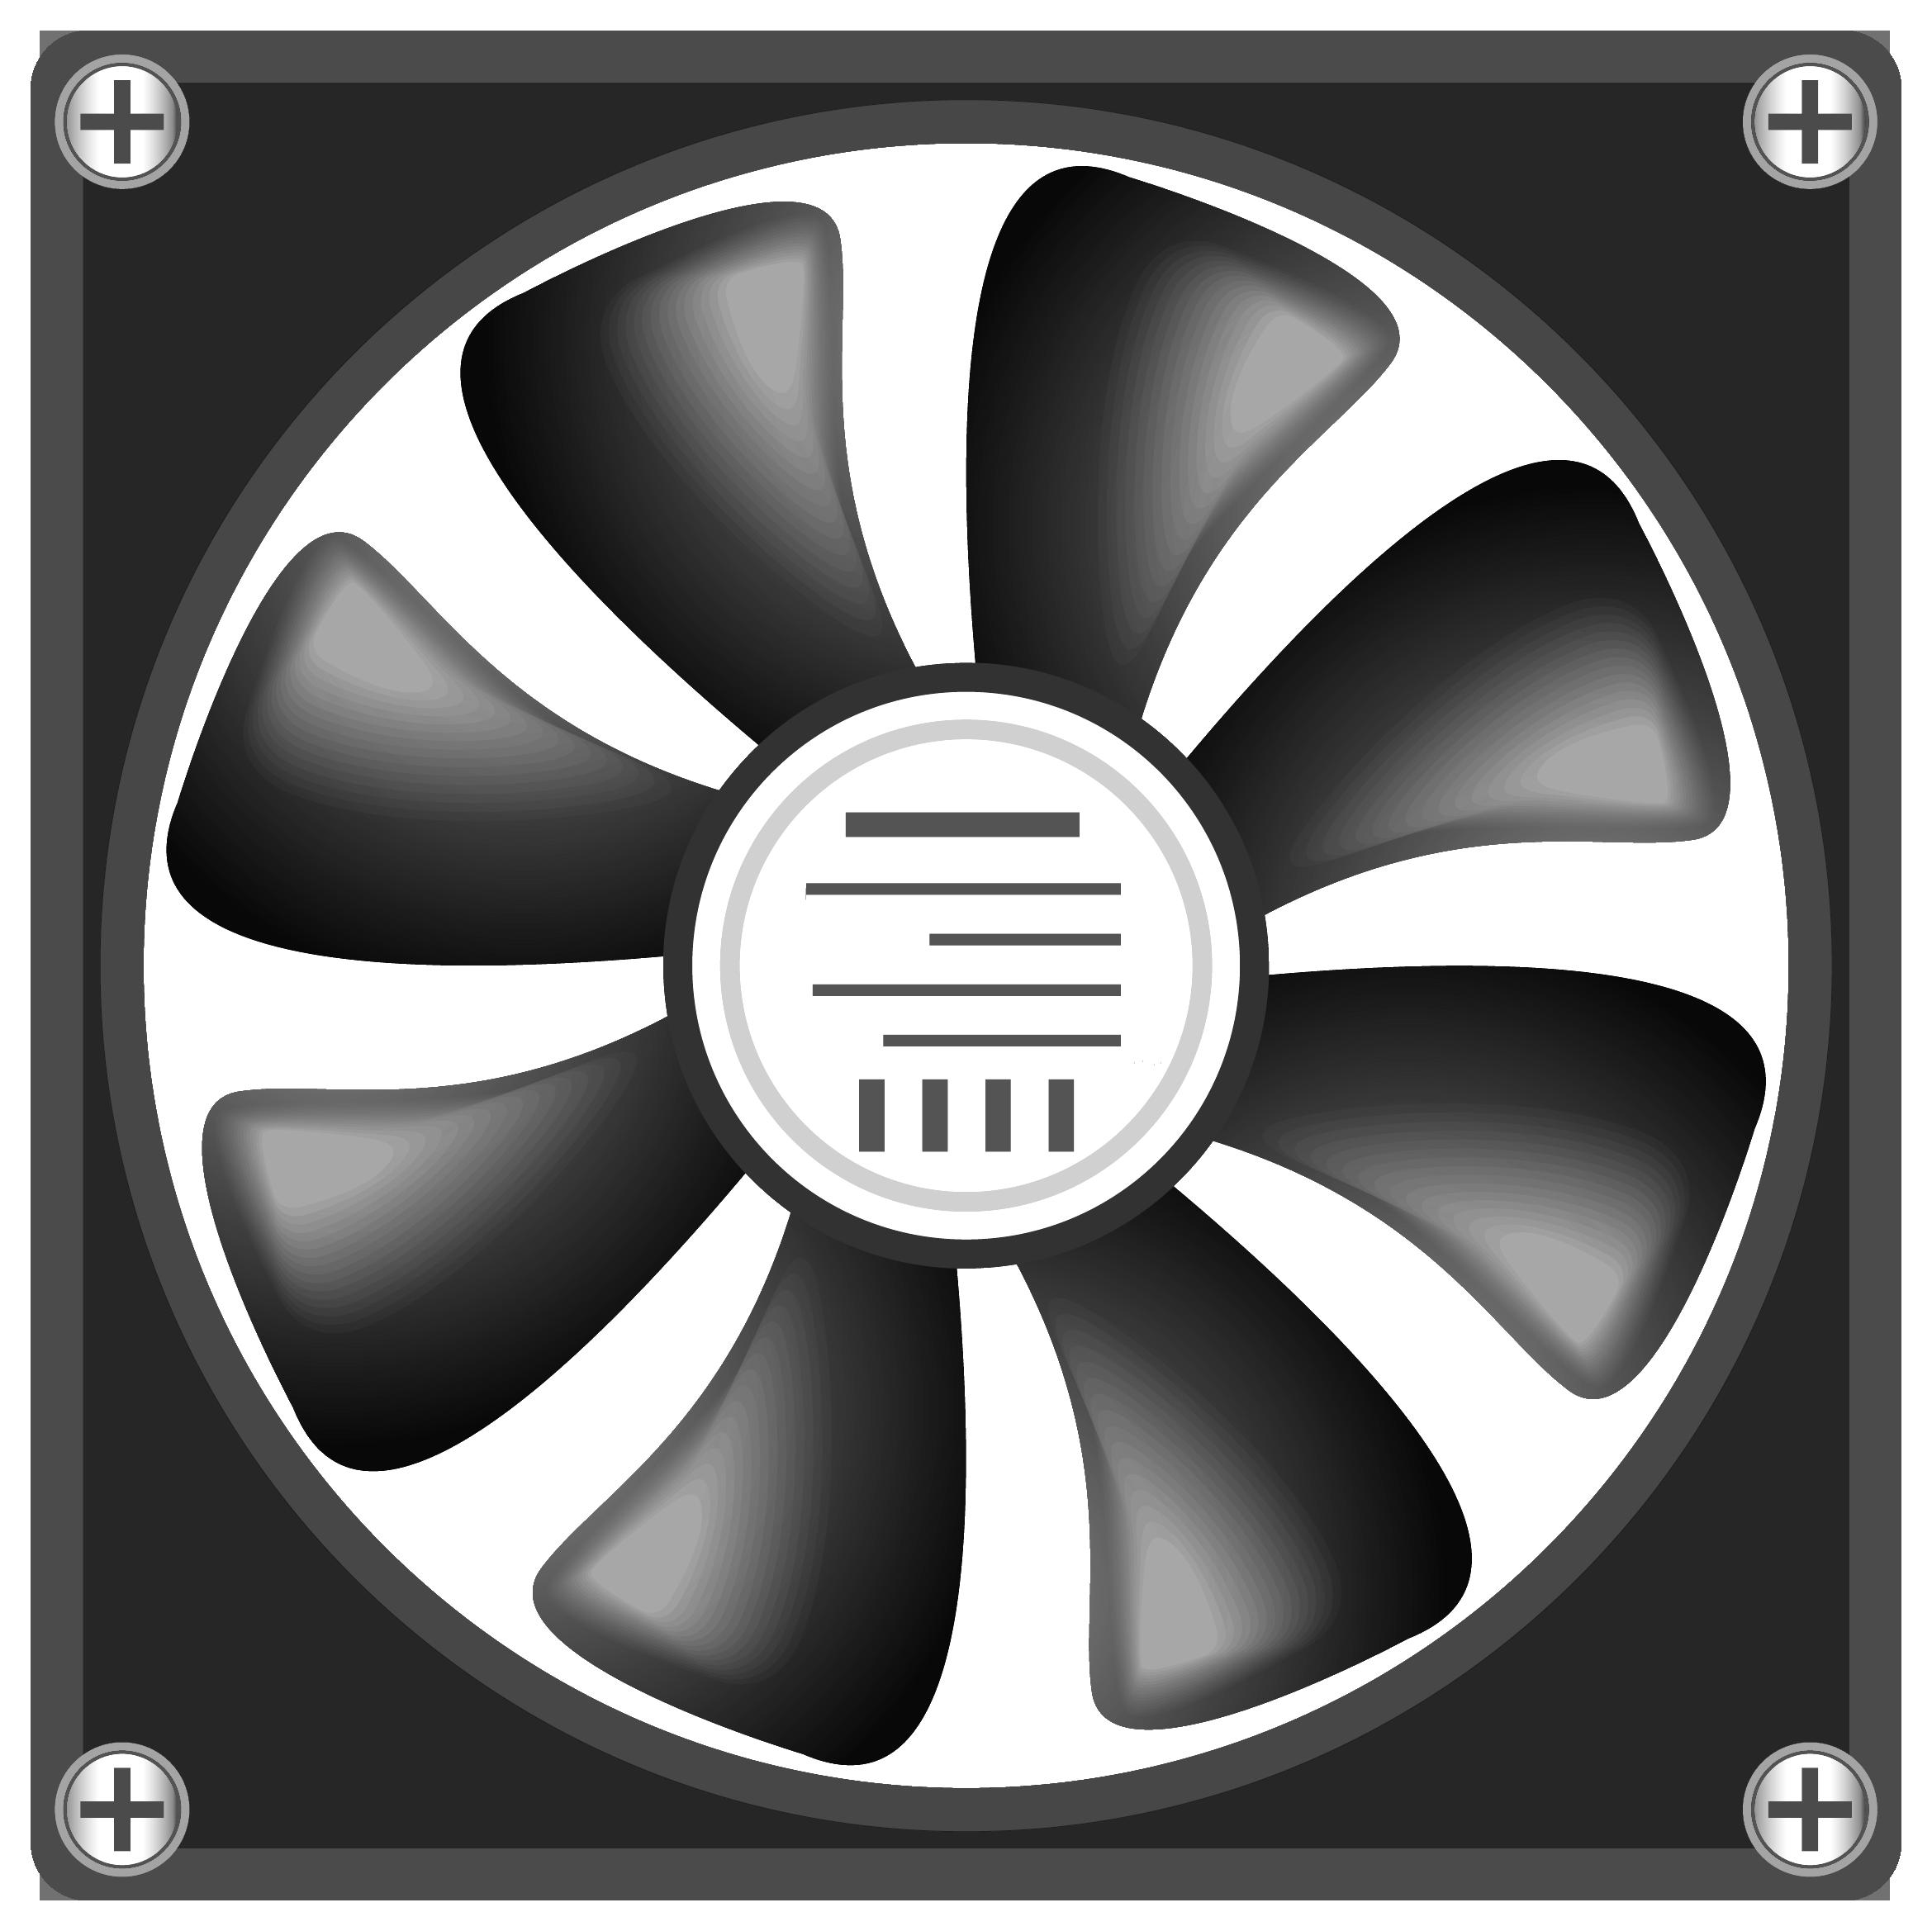 v fan png. Website clipart network computer